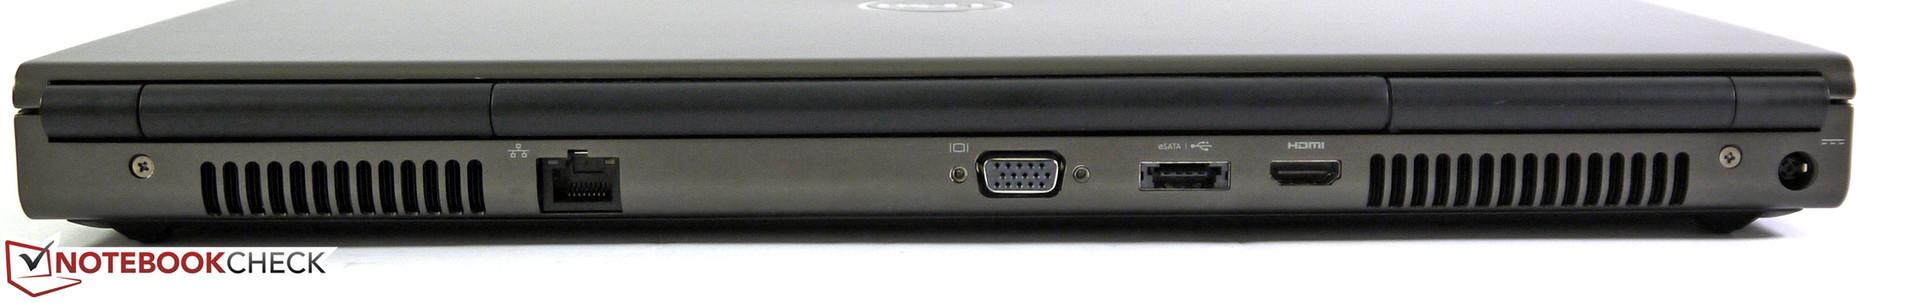 m4800